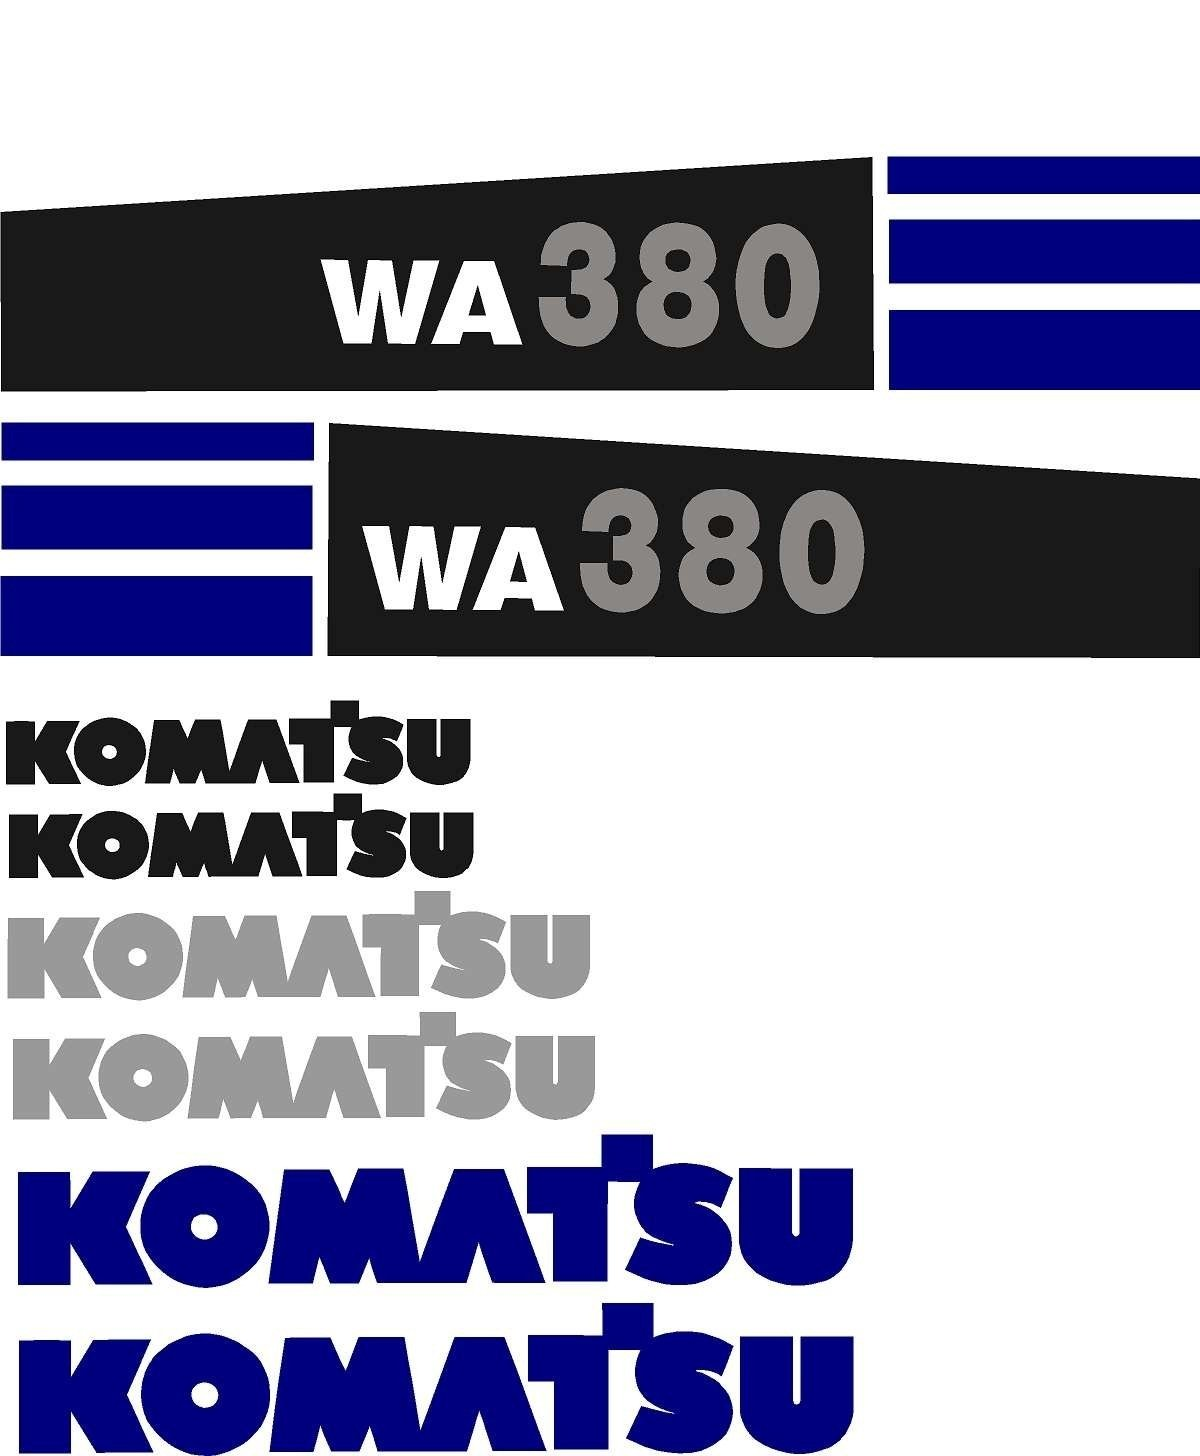 high quality aftermarket Komatsu WA380 Wheel Loader Decal Kit With Warnings